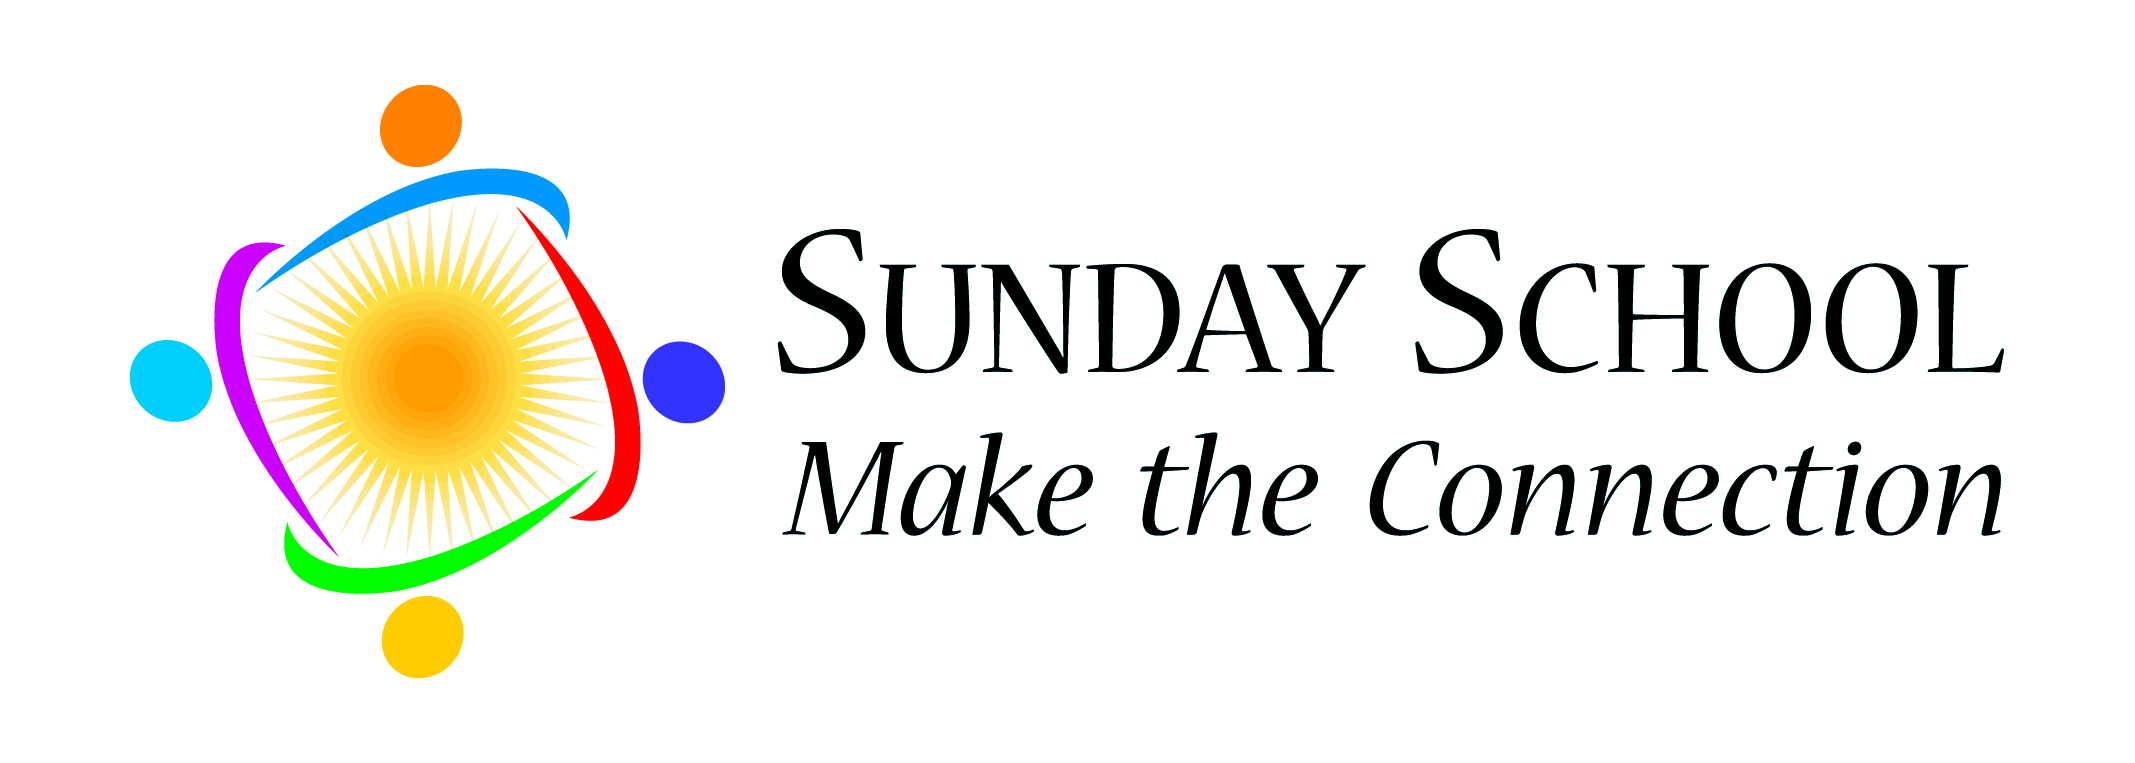 Watch more like Sunday School Clip Art.